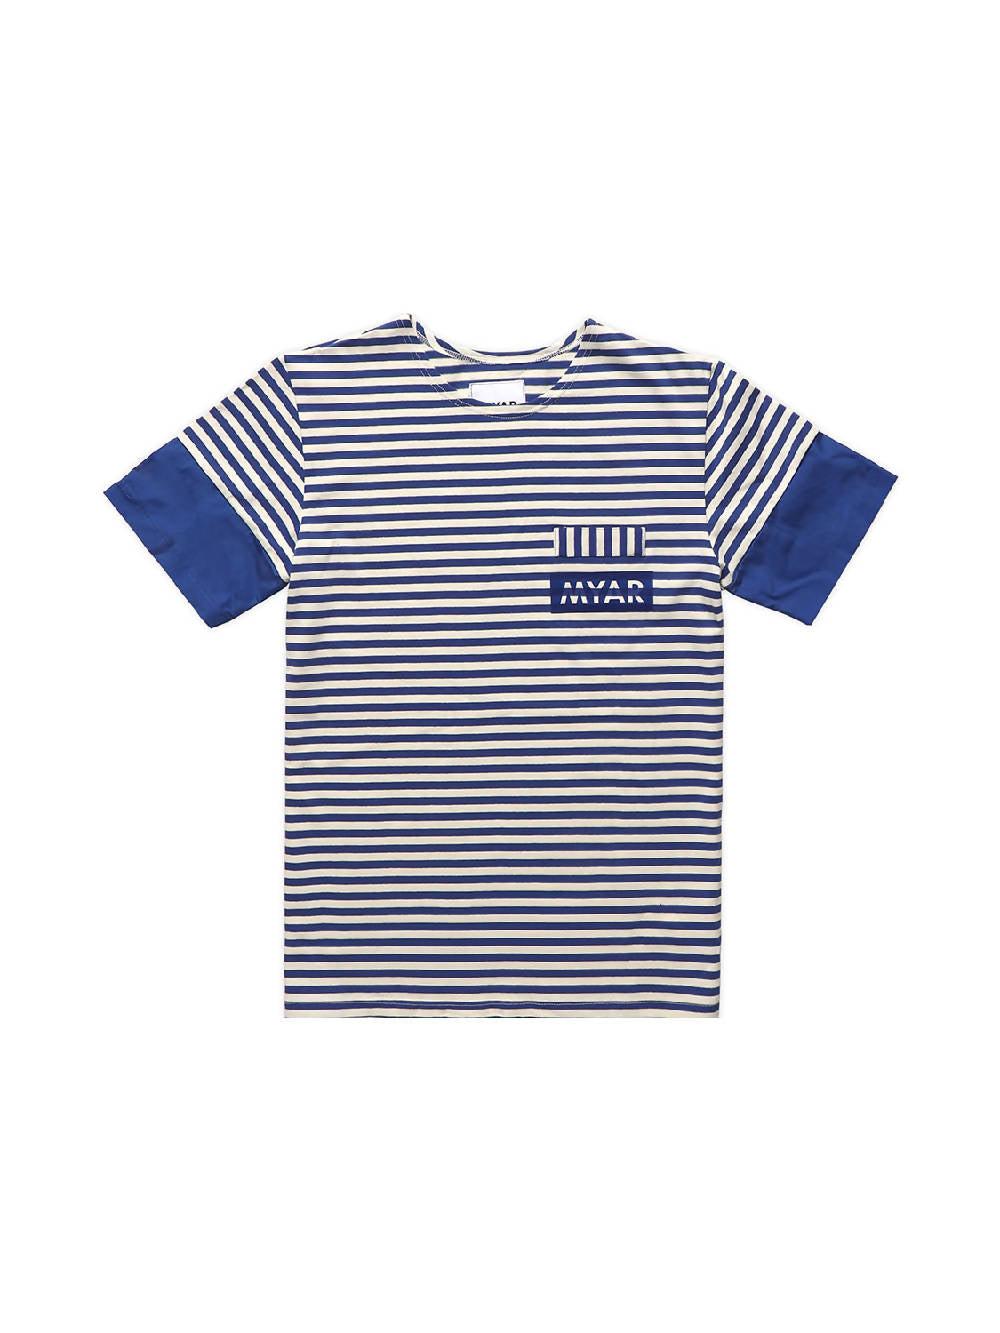 MYAR Blue and White RUT0Z Striped T-Shirt